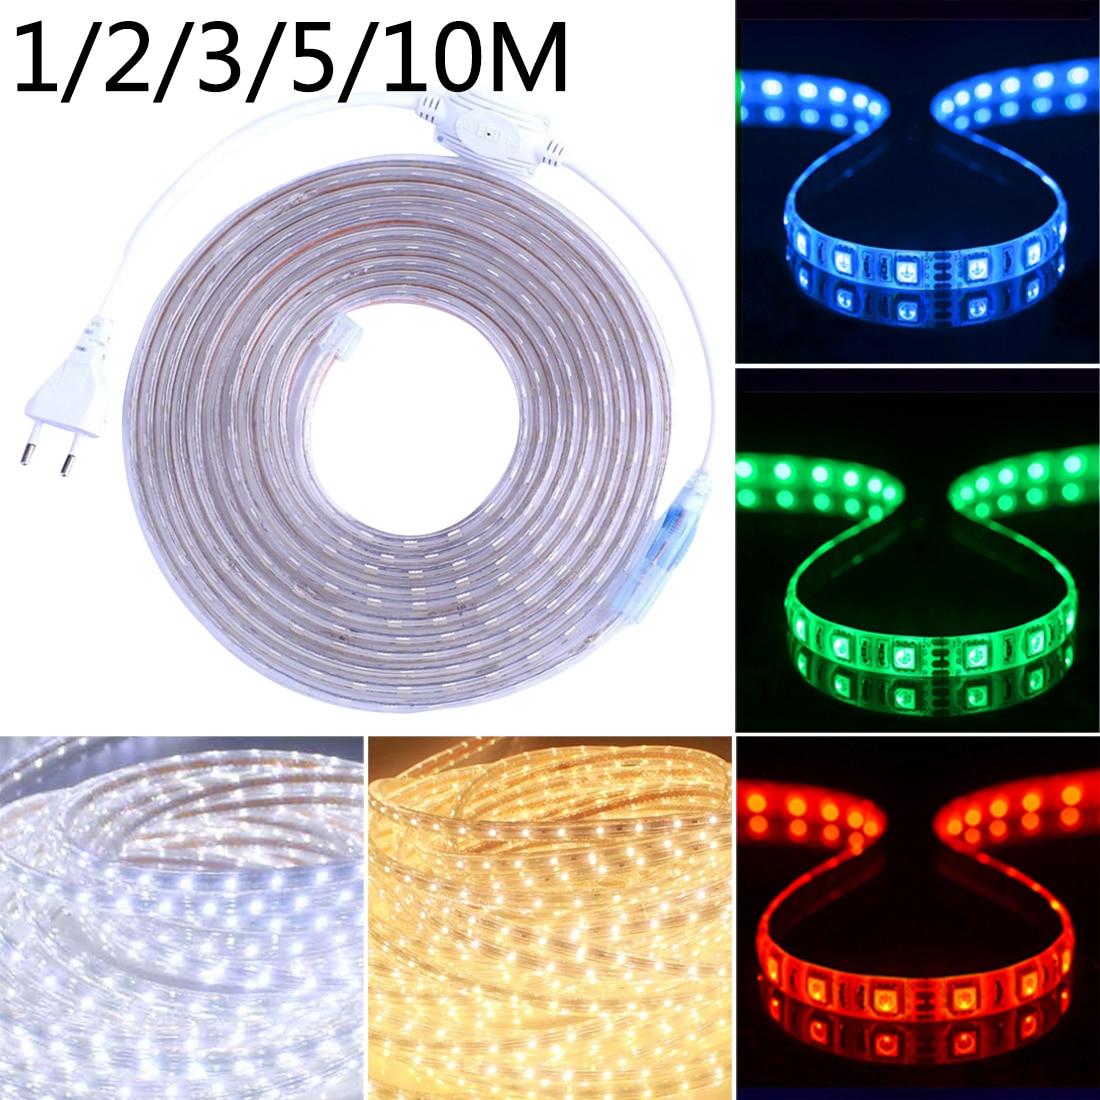 Waterproof Flexible Decoration Lamp Led Strip Lamps Flexible Light Tape Ribbon Smd 5050 With Eu Power Plug Ac220v 1/2/3/5/10m Lights & Lighting Led Strips